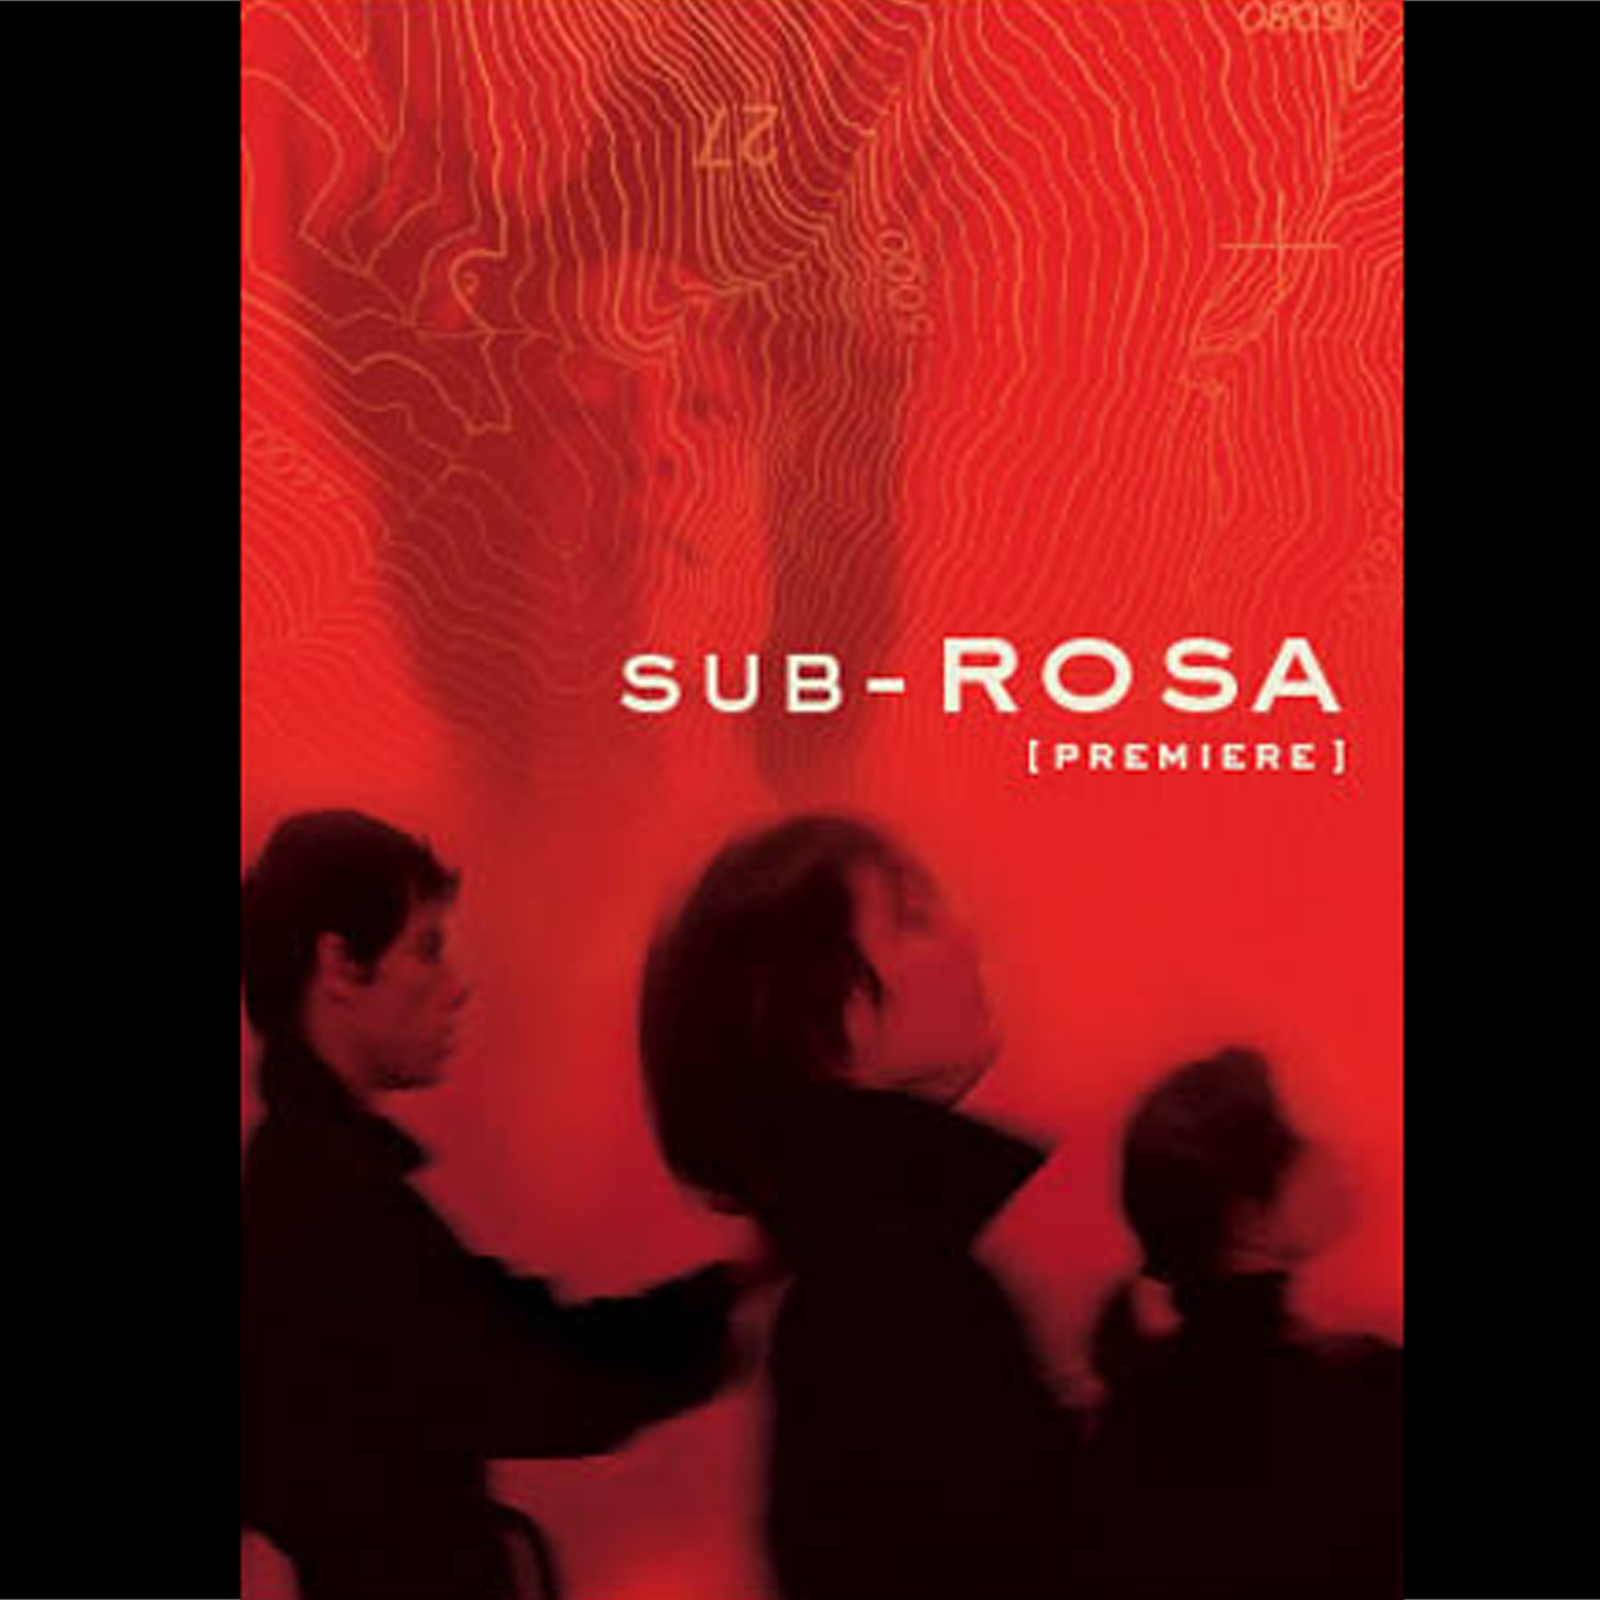 subrosalg